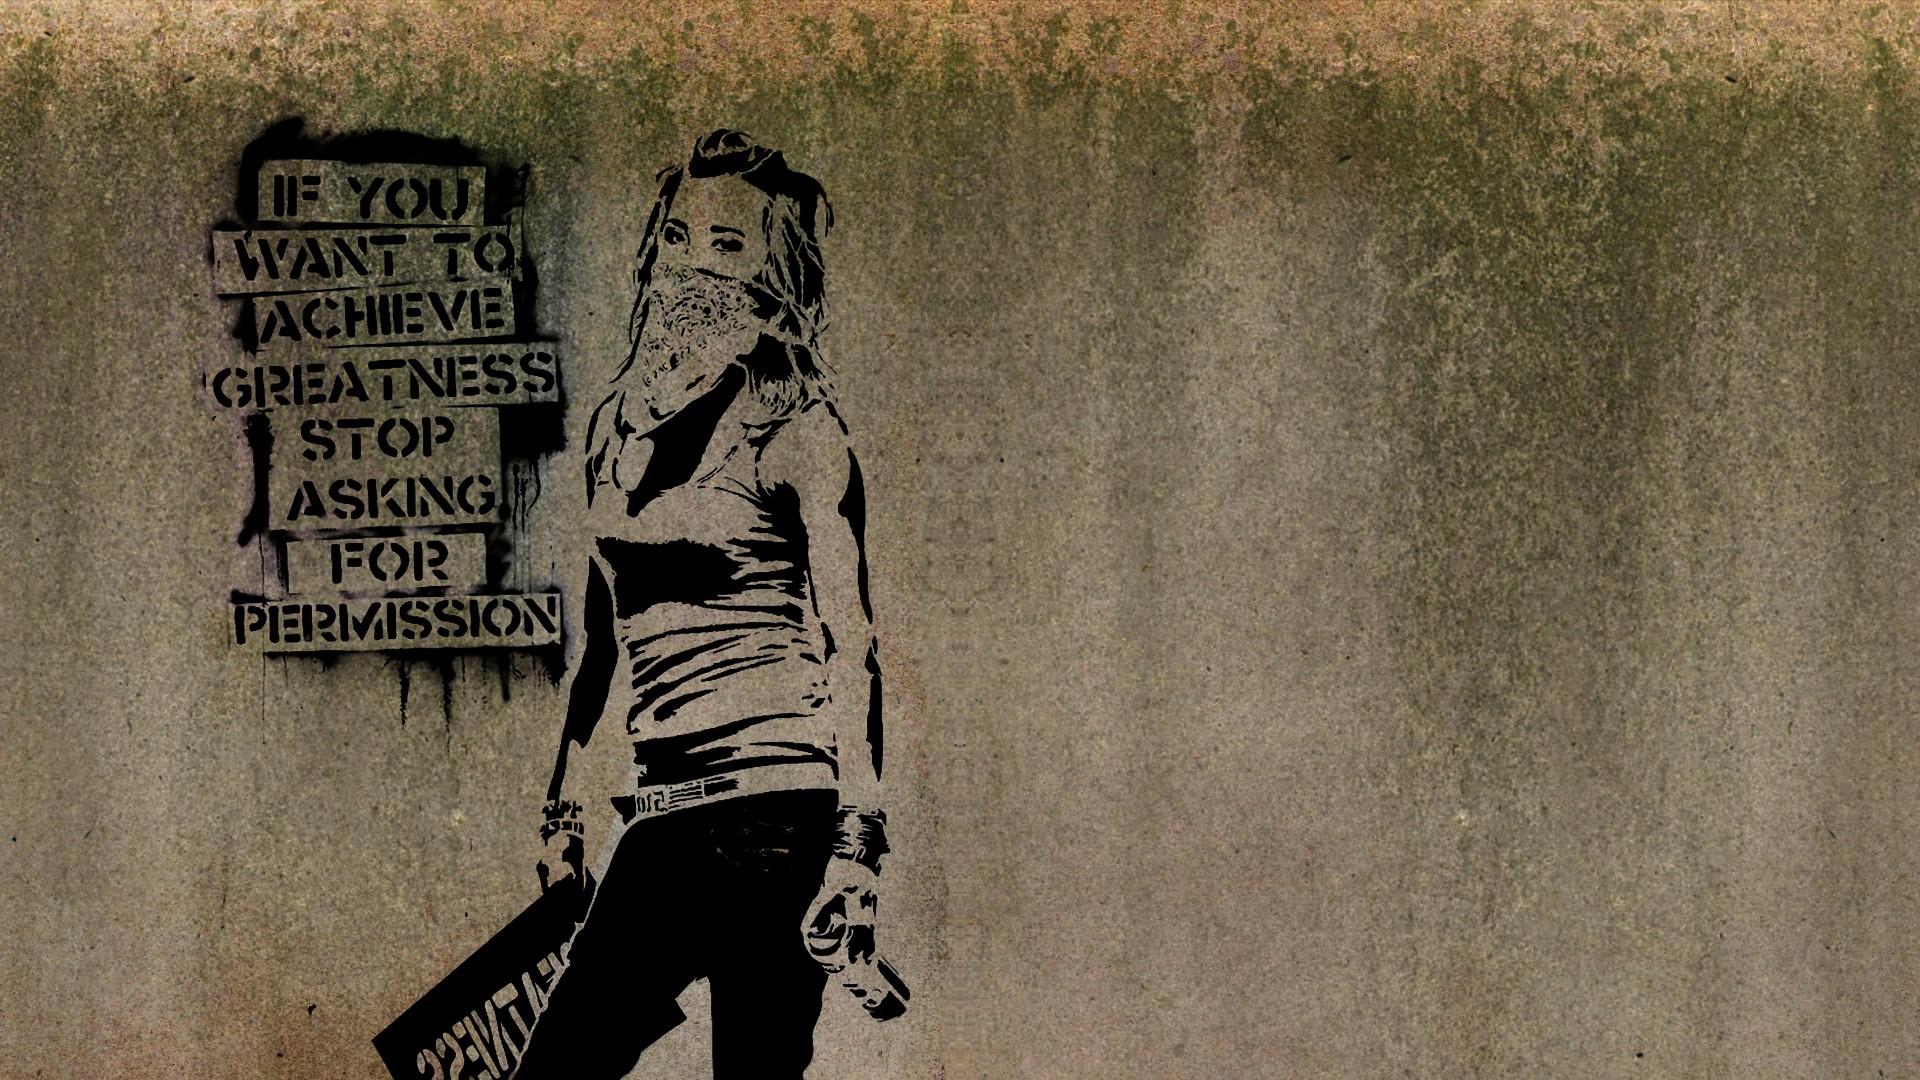 Drawing Quote Women Minimalism Wall Artwork Text Scarf Inspirational Graffiti Banksy Art